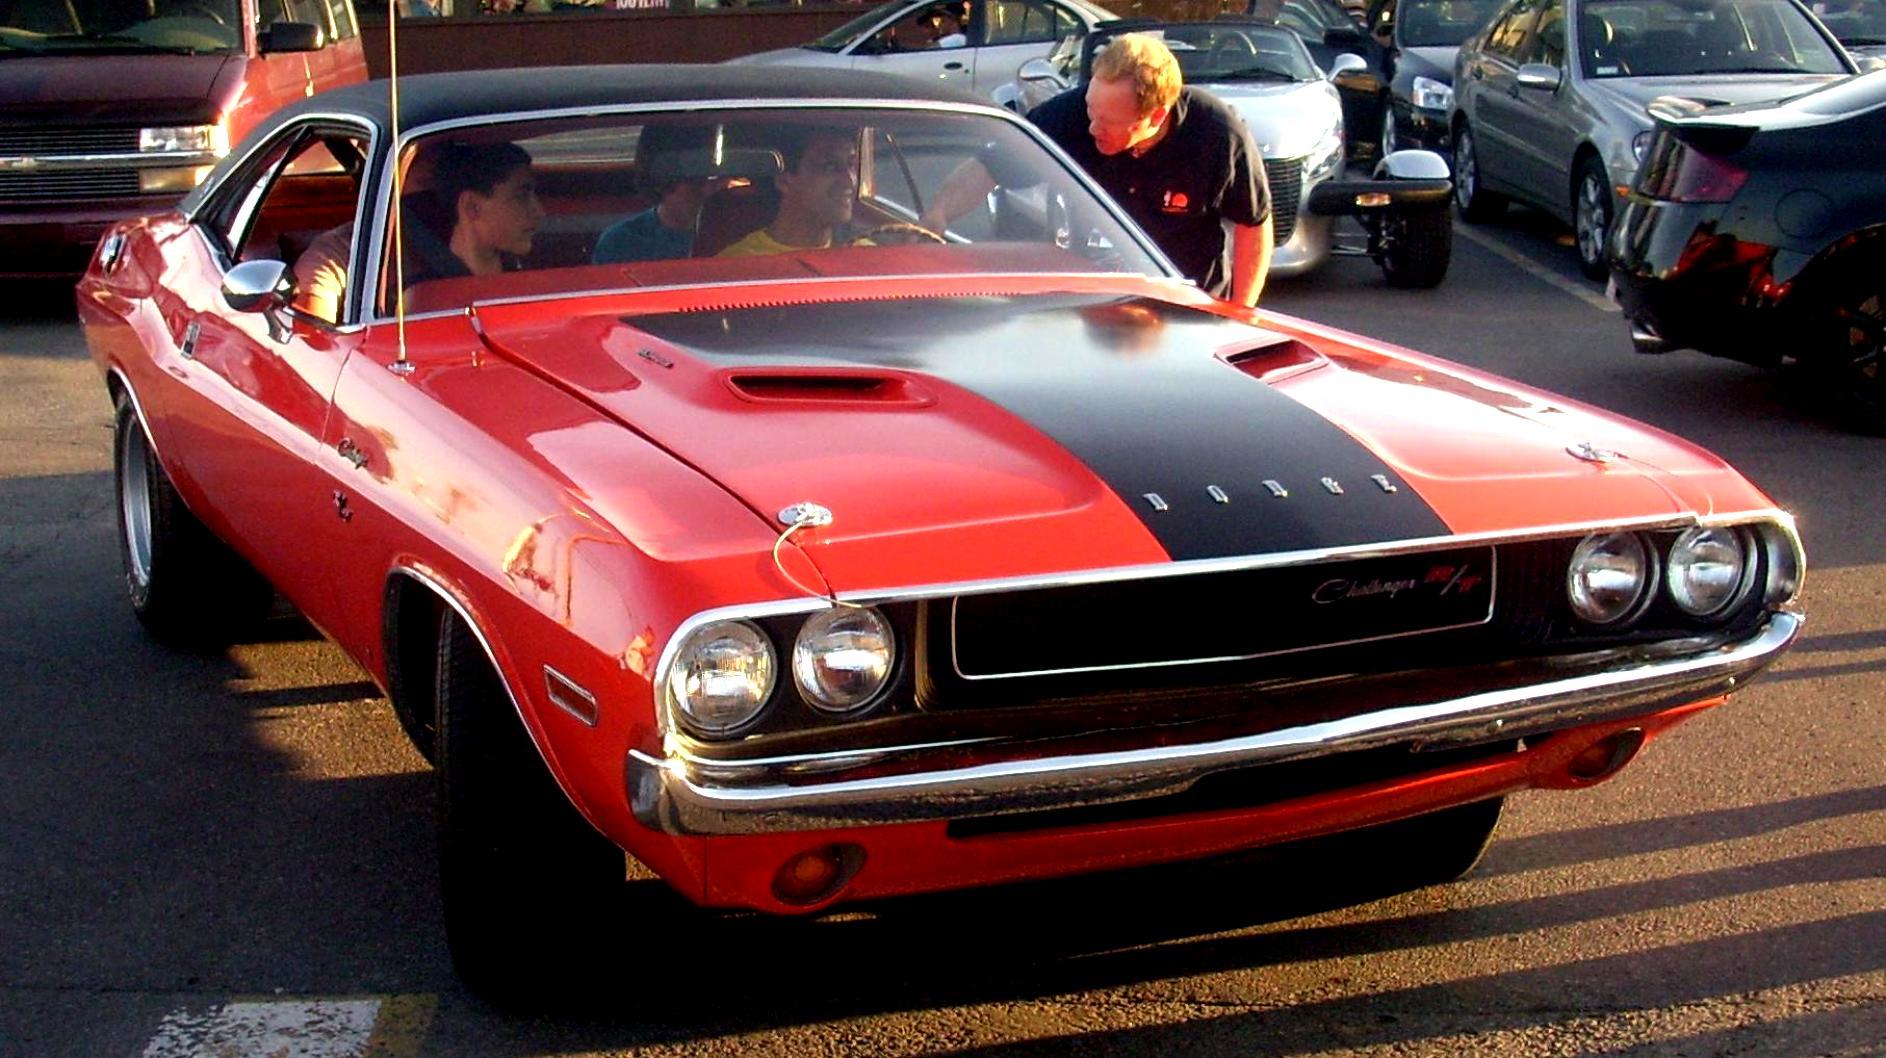 Dodge Challenger 1969 Photos 6 On Motoimg Com